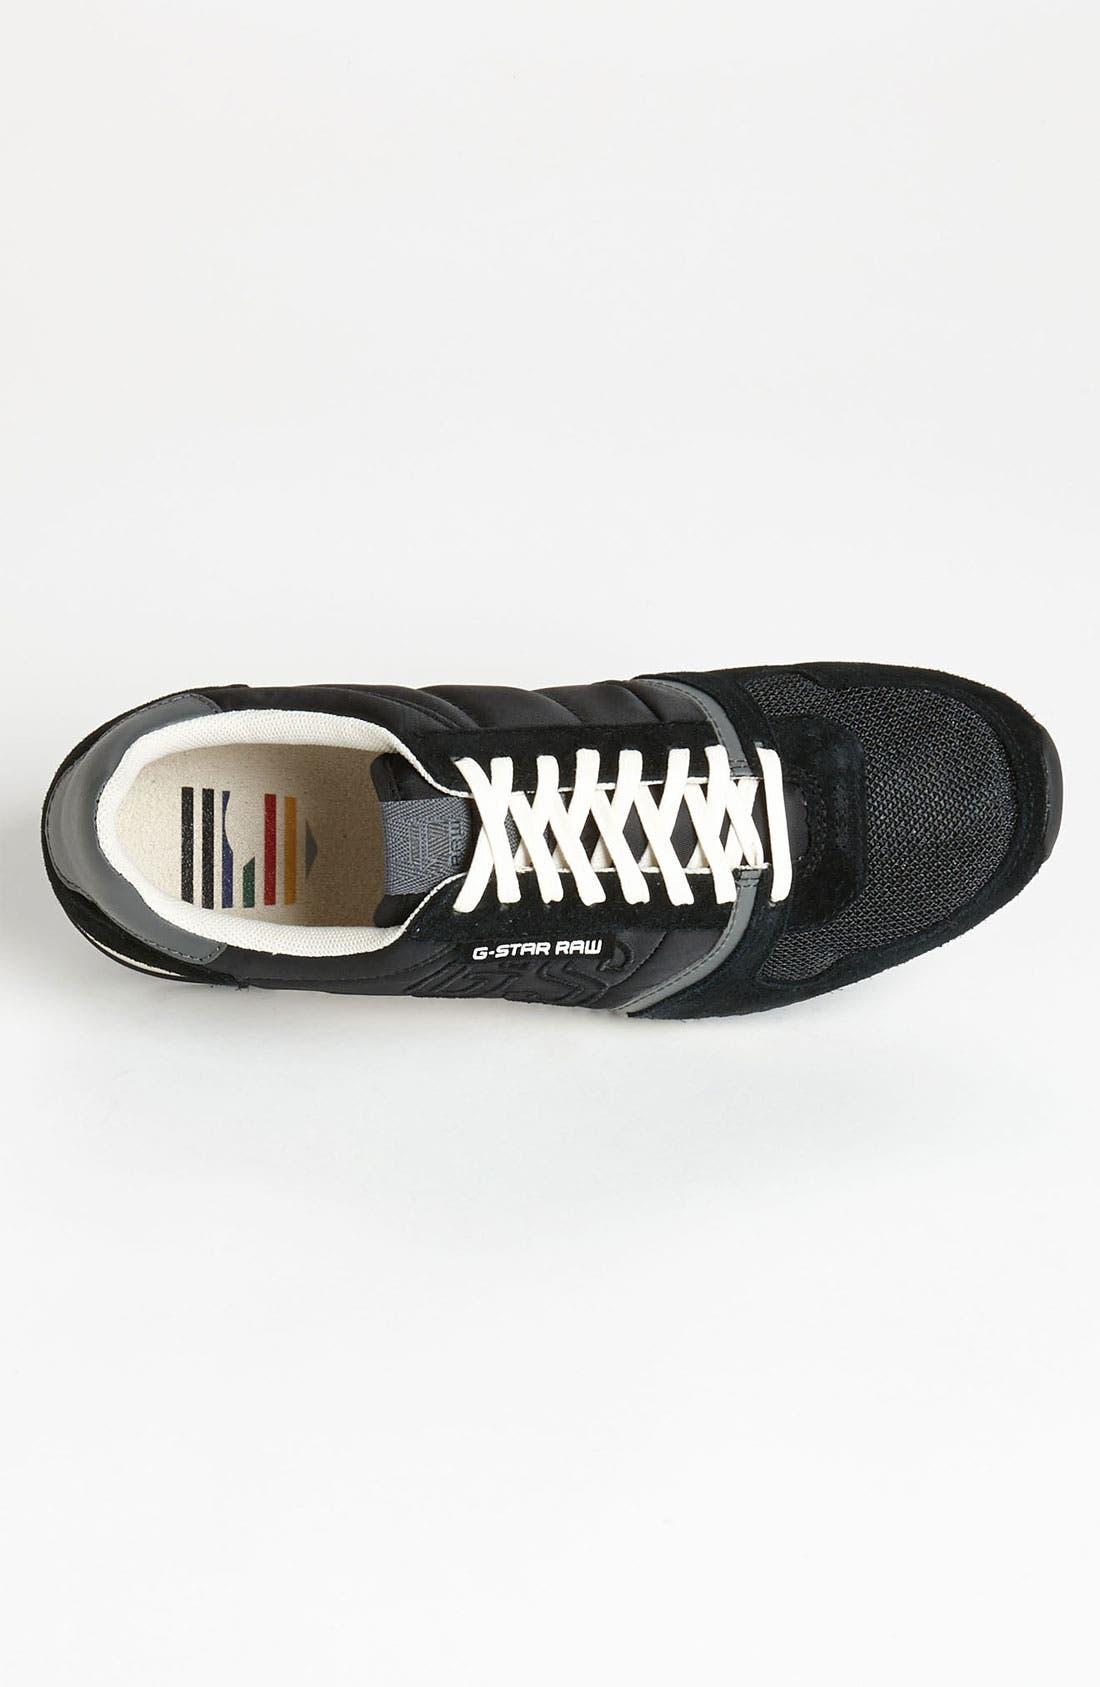 Alternate Image 3  - G-Star Raw 'Track Futura' Sneaker (Men)